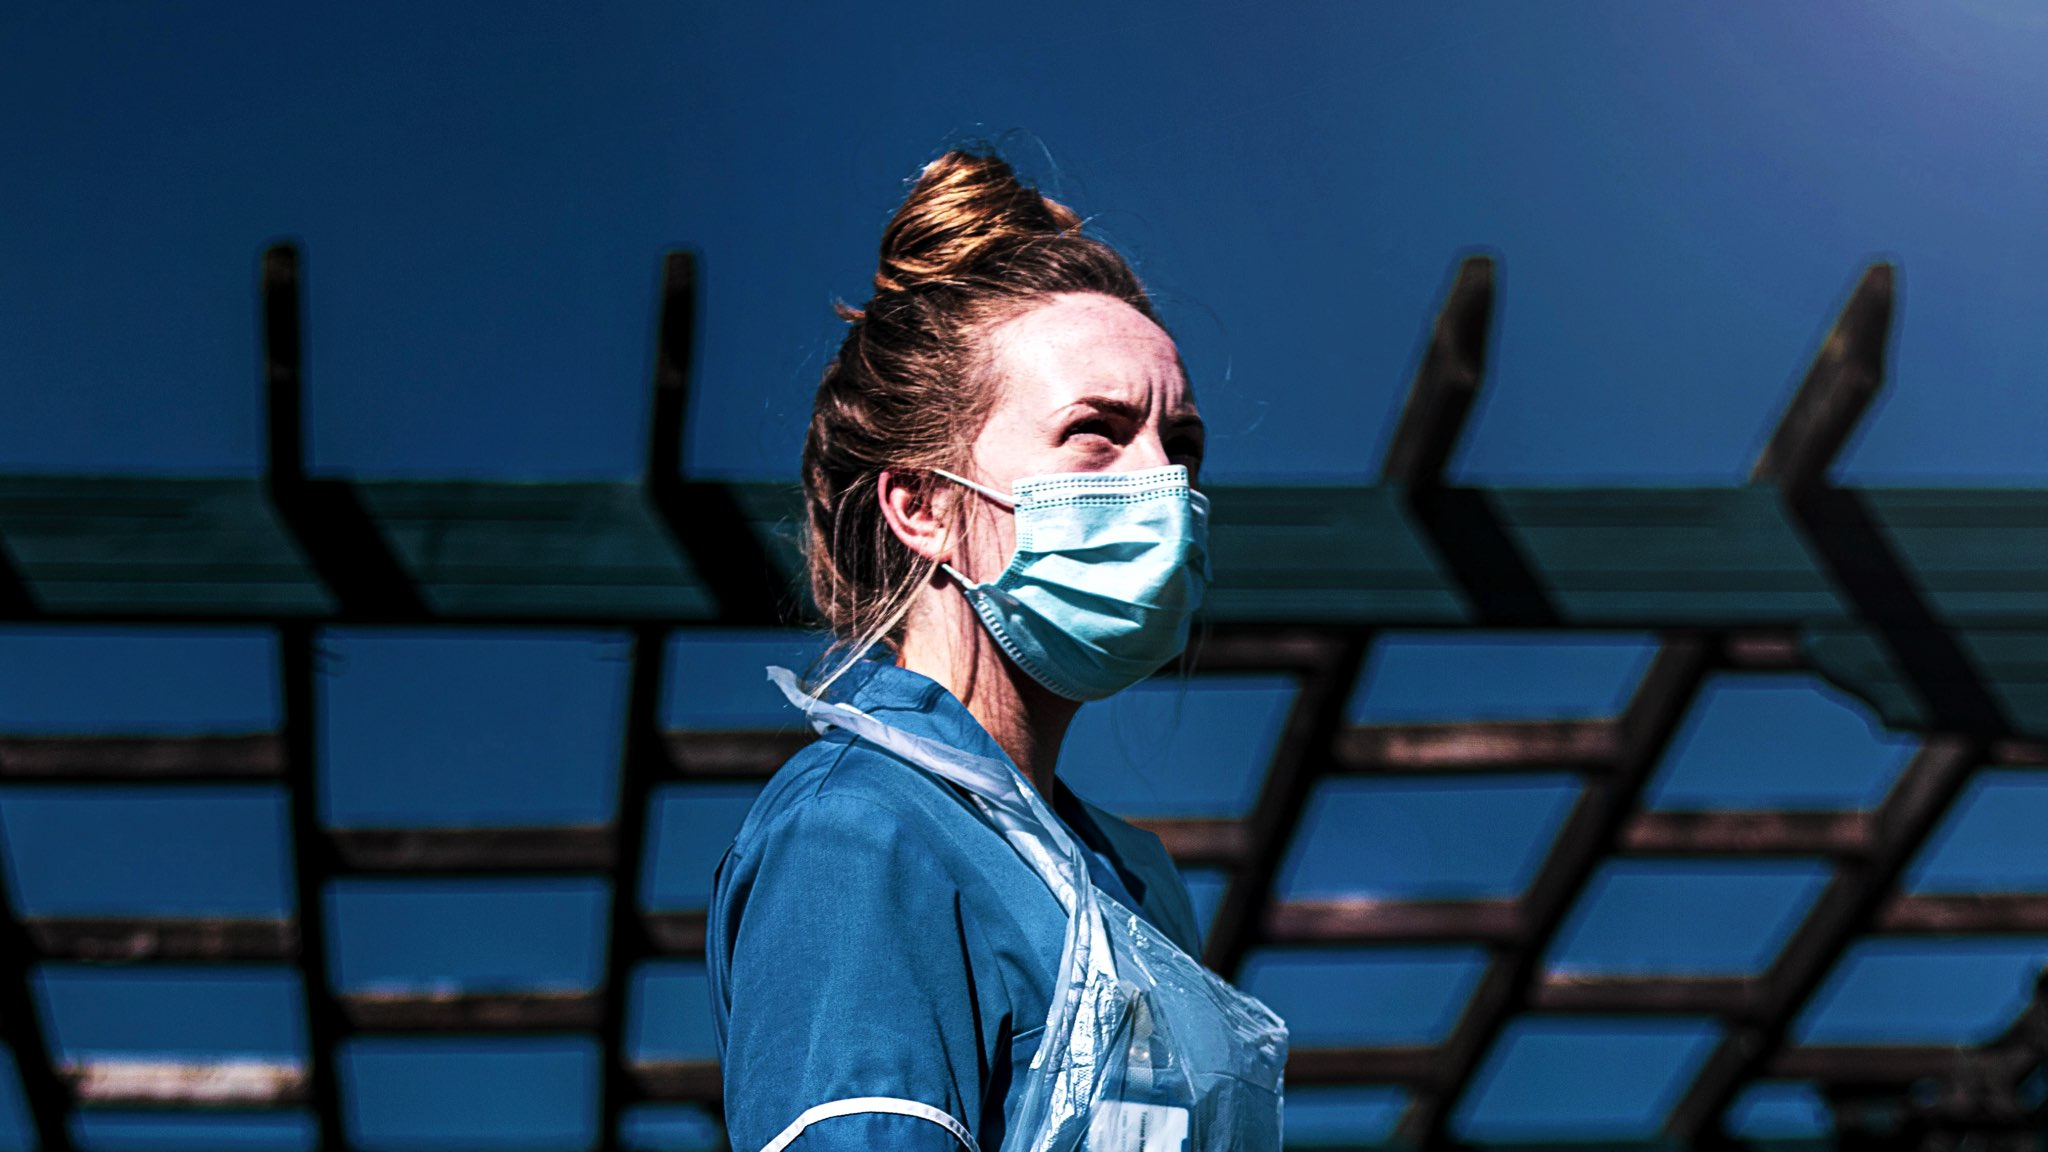 Kehidupan Kala Pandemi: Bagaimana Hidupku Berubah Sejak COVID-19